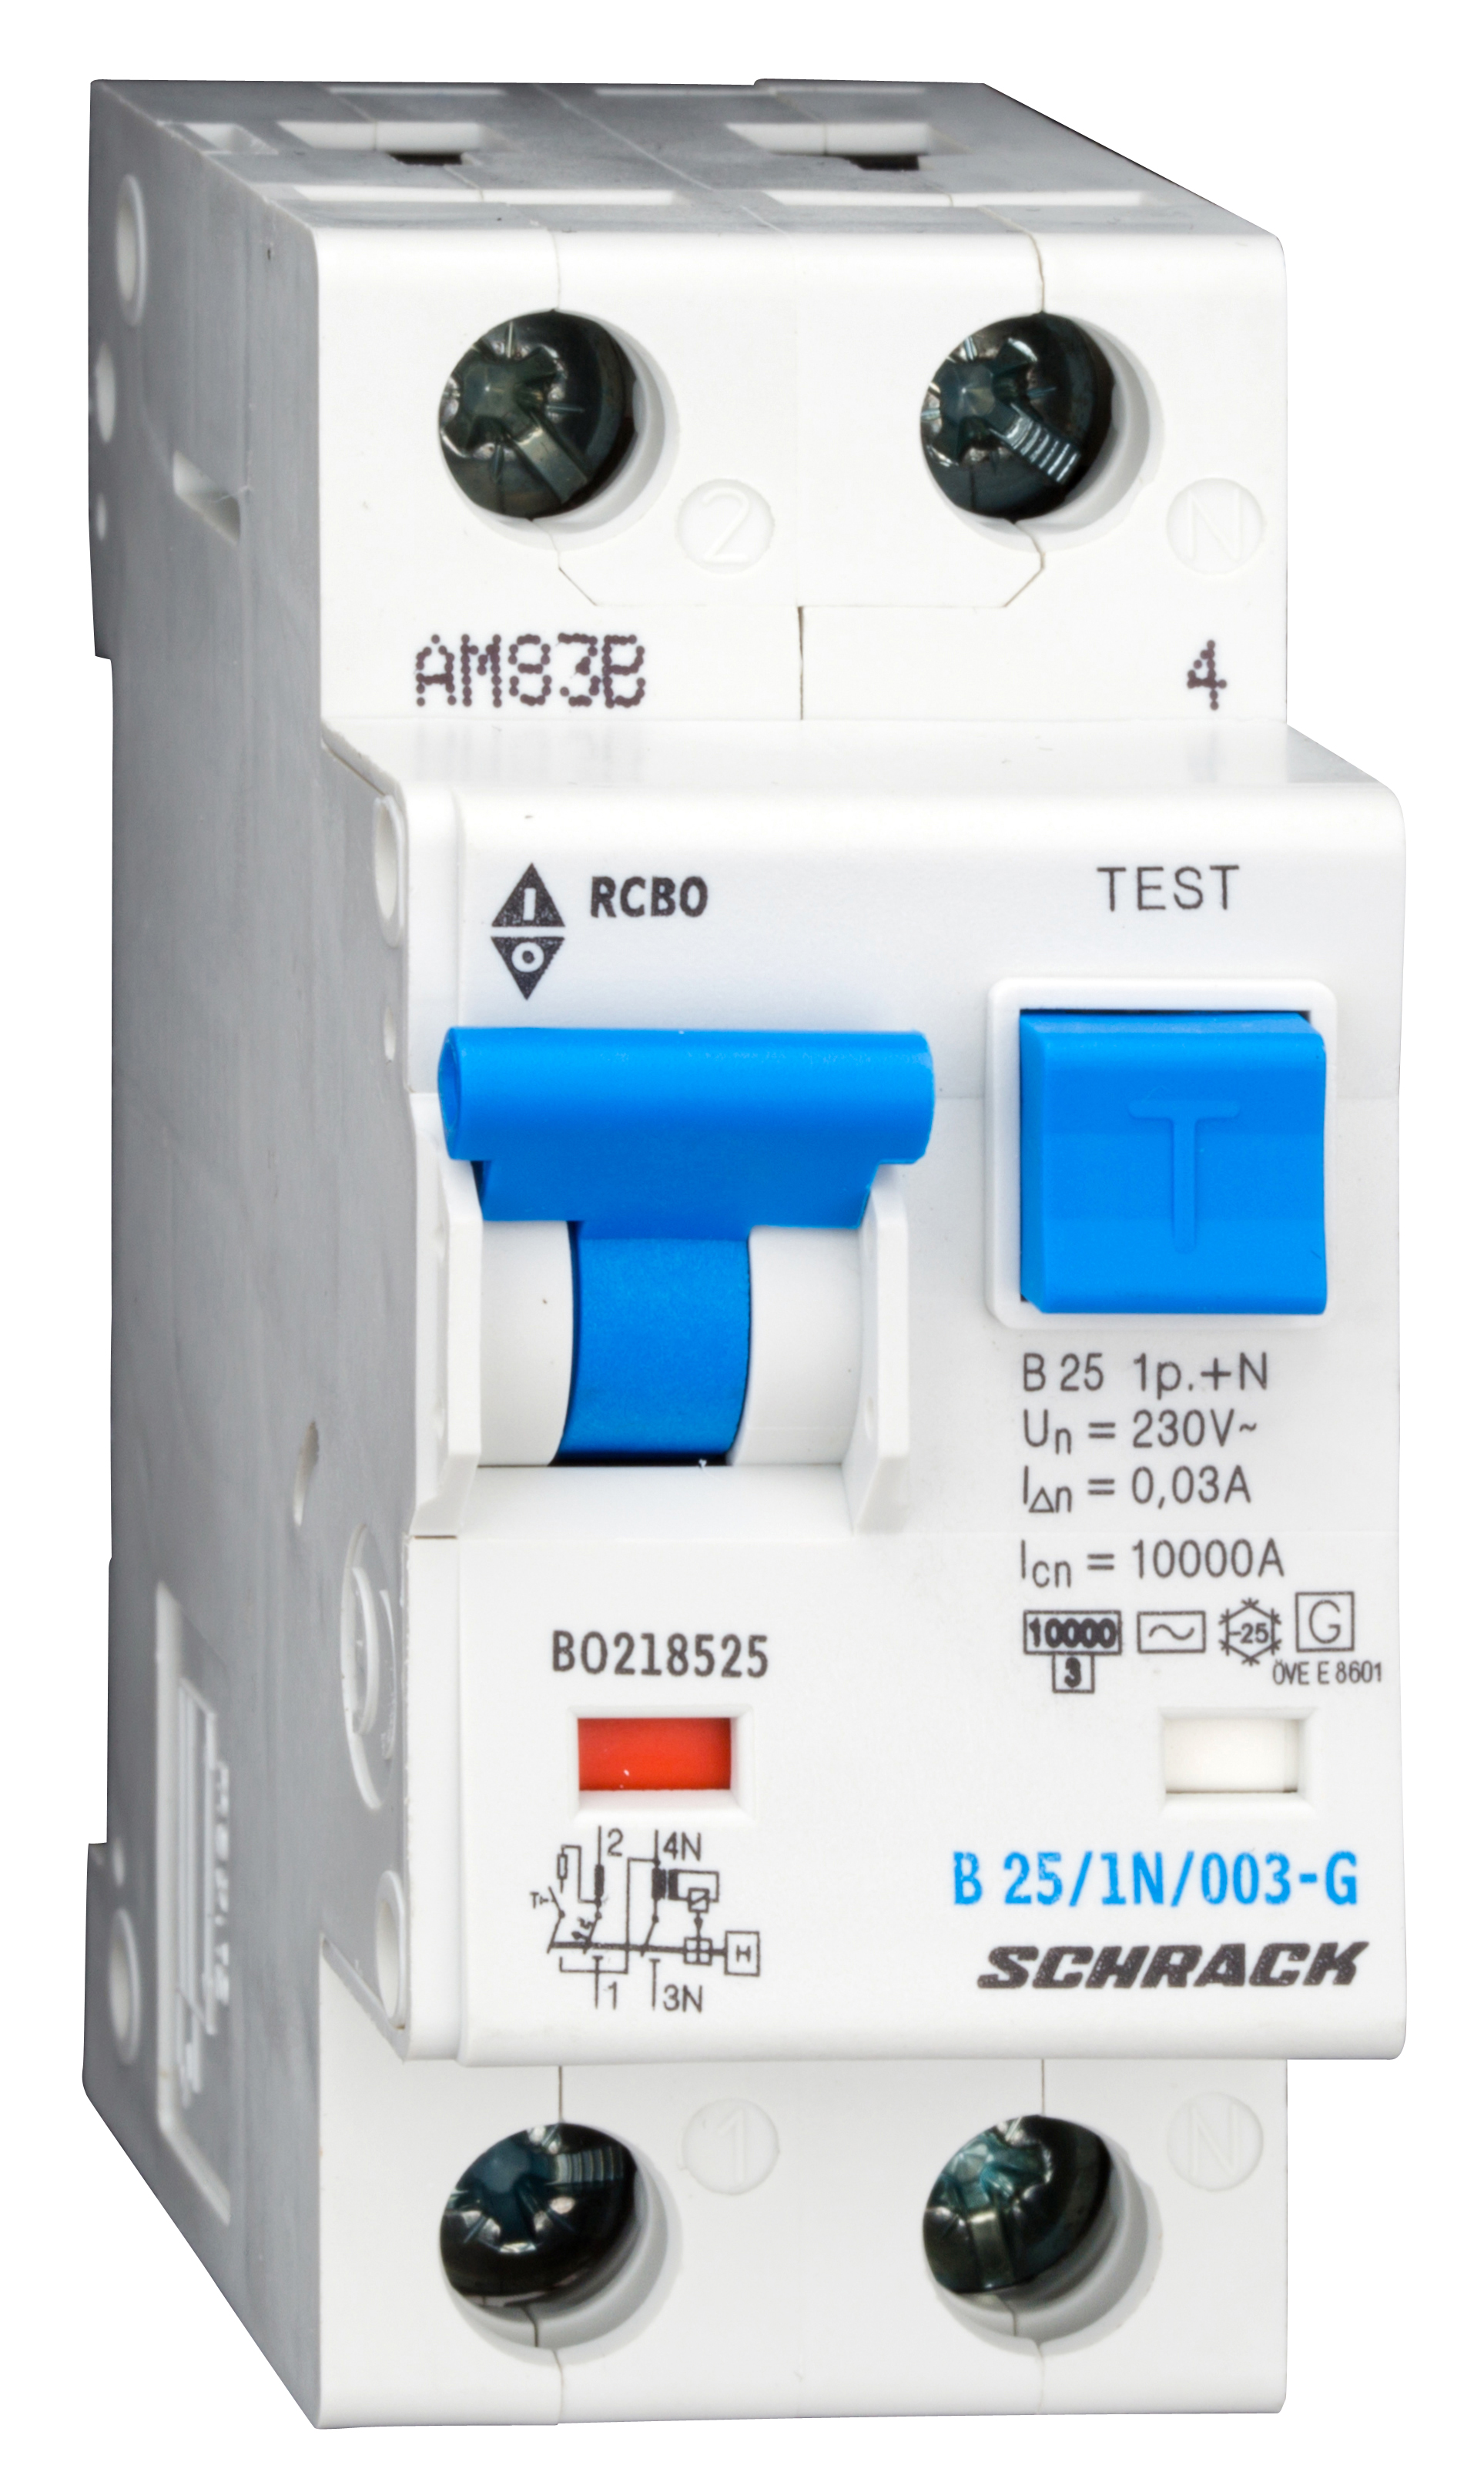 1 Stk LS-FI-Schalter,Kennl.B,25A,30mA,1-polig+N, Bauart G,Typ AC BO218525--